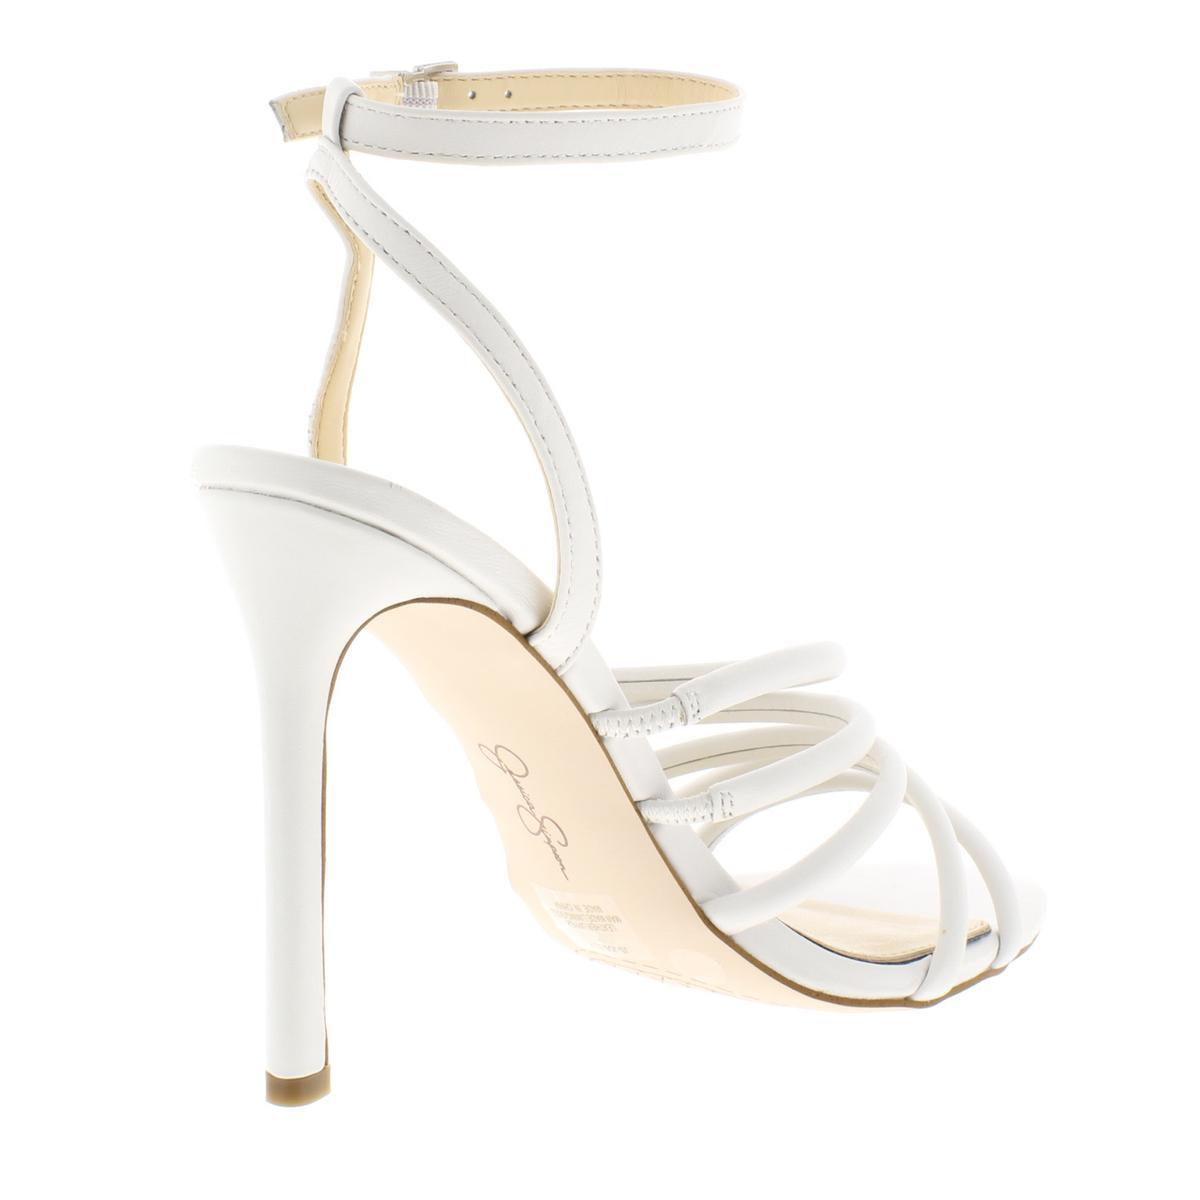 Jessica-Simpson-Femme-Joselle-a-Lanieres-Talon-Haut-Robe-Sandales-Chaussures-BHFO-7879 miniature 10